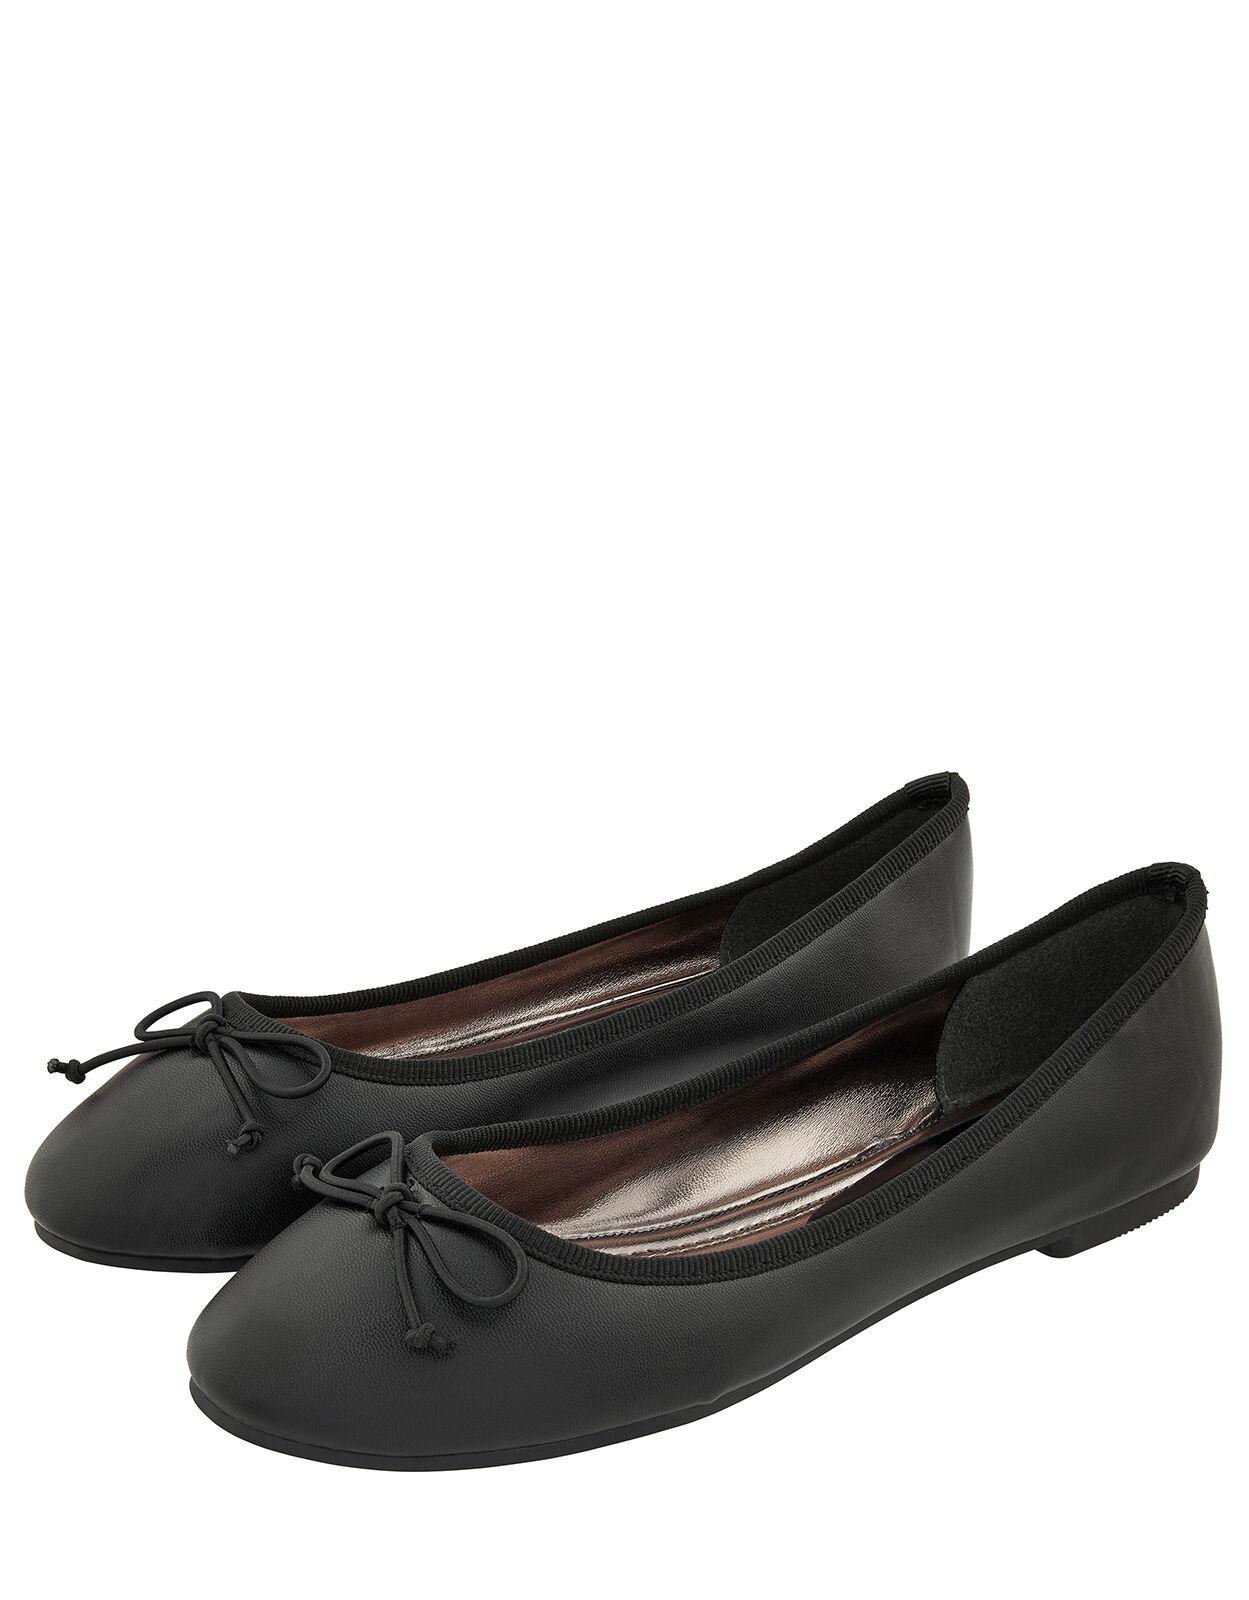 Bow Ballerina Flat Shoes Black | Flat